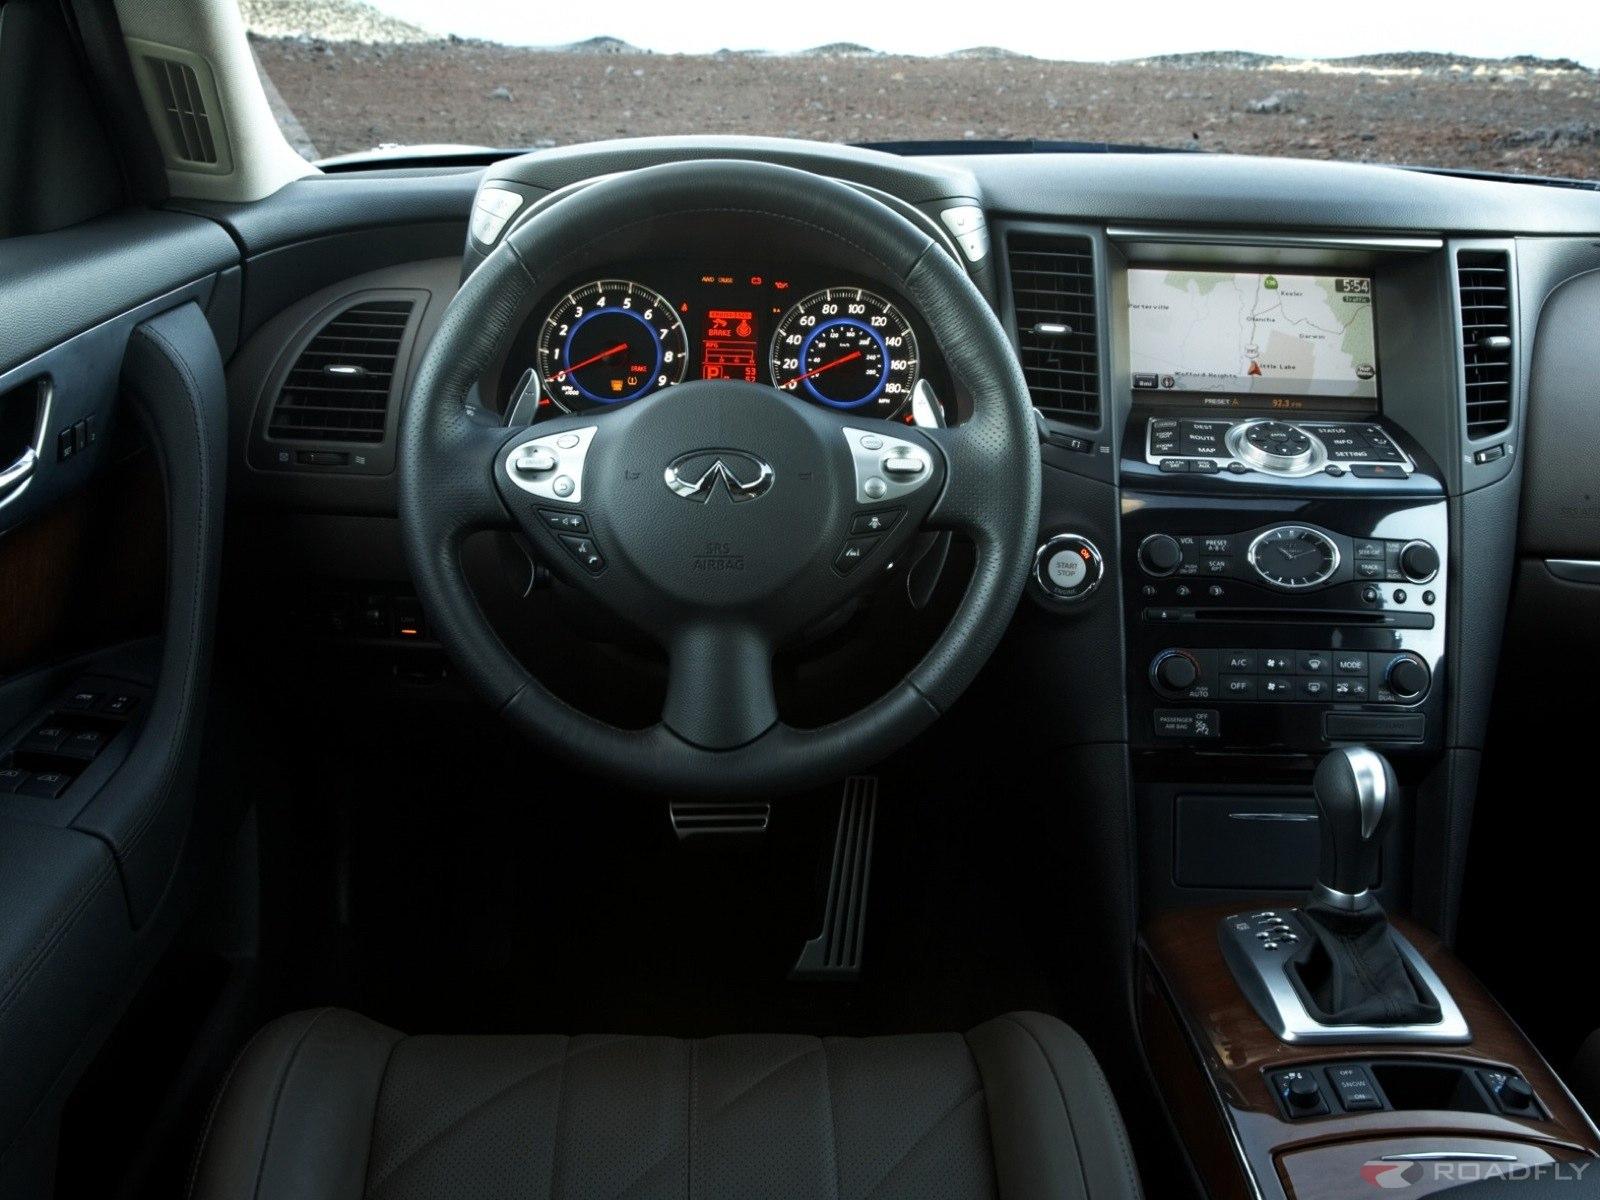 Infiniti fx 35 interior worldcar infiniti fx 35 interior vanachro Images